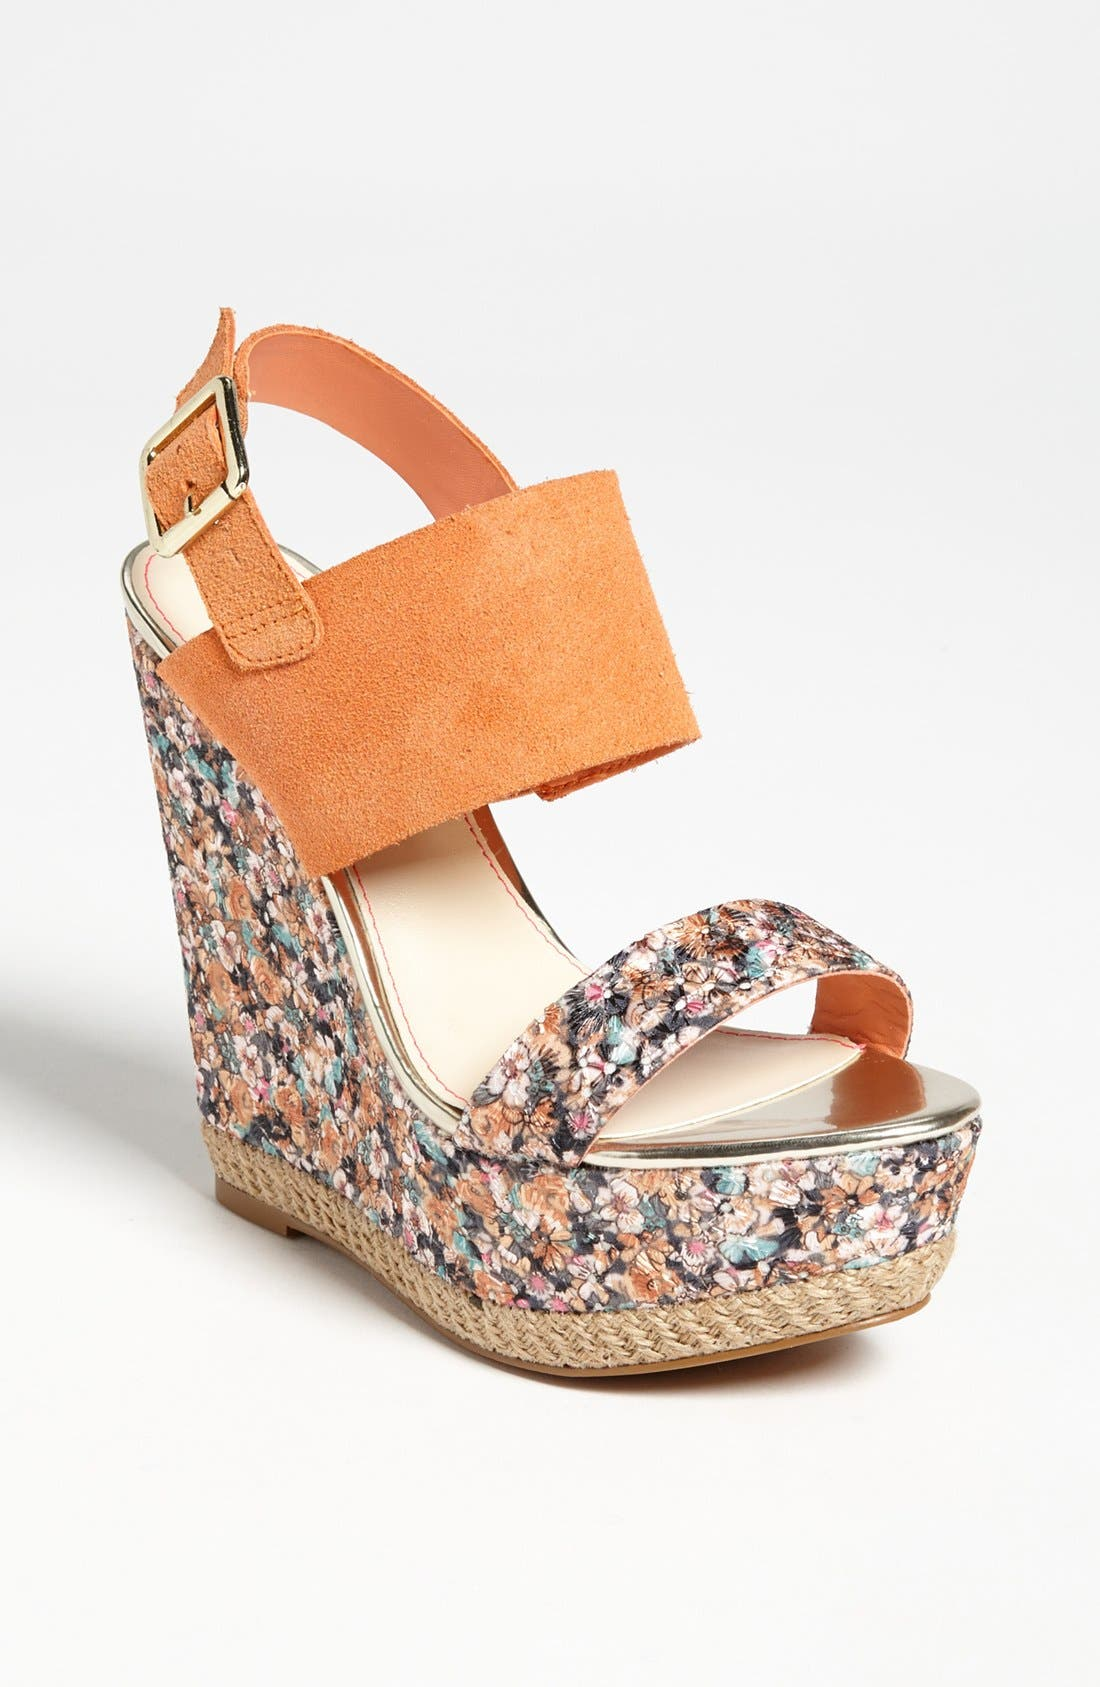 Alternate Image 1 Selected - Betsey Johnson 'Rambling' Sandal